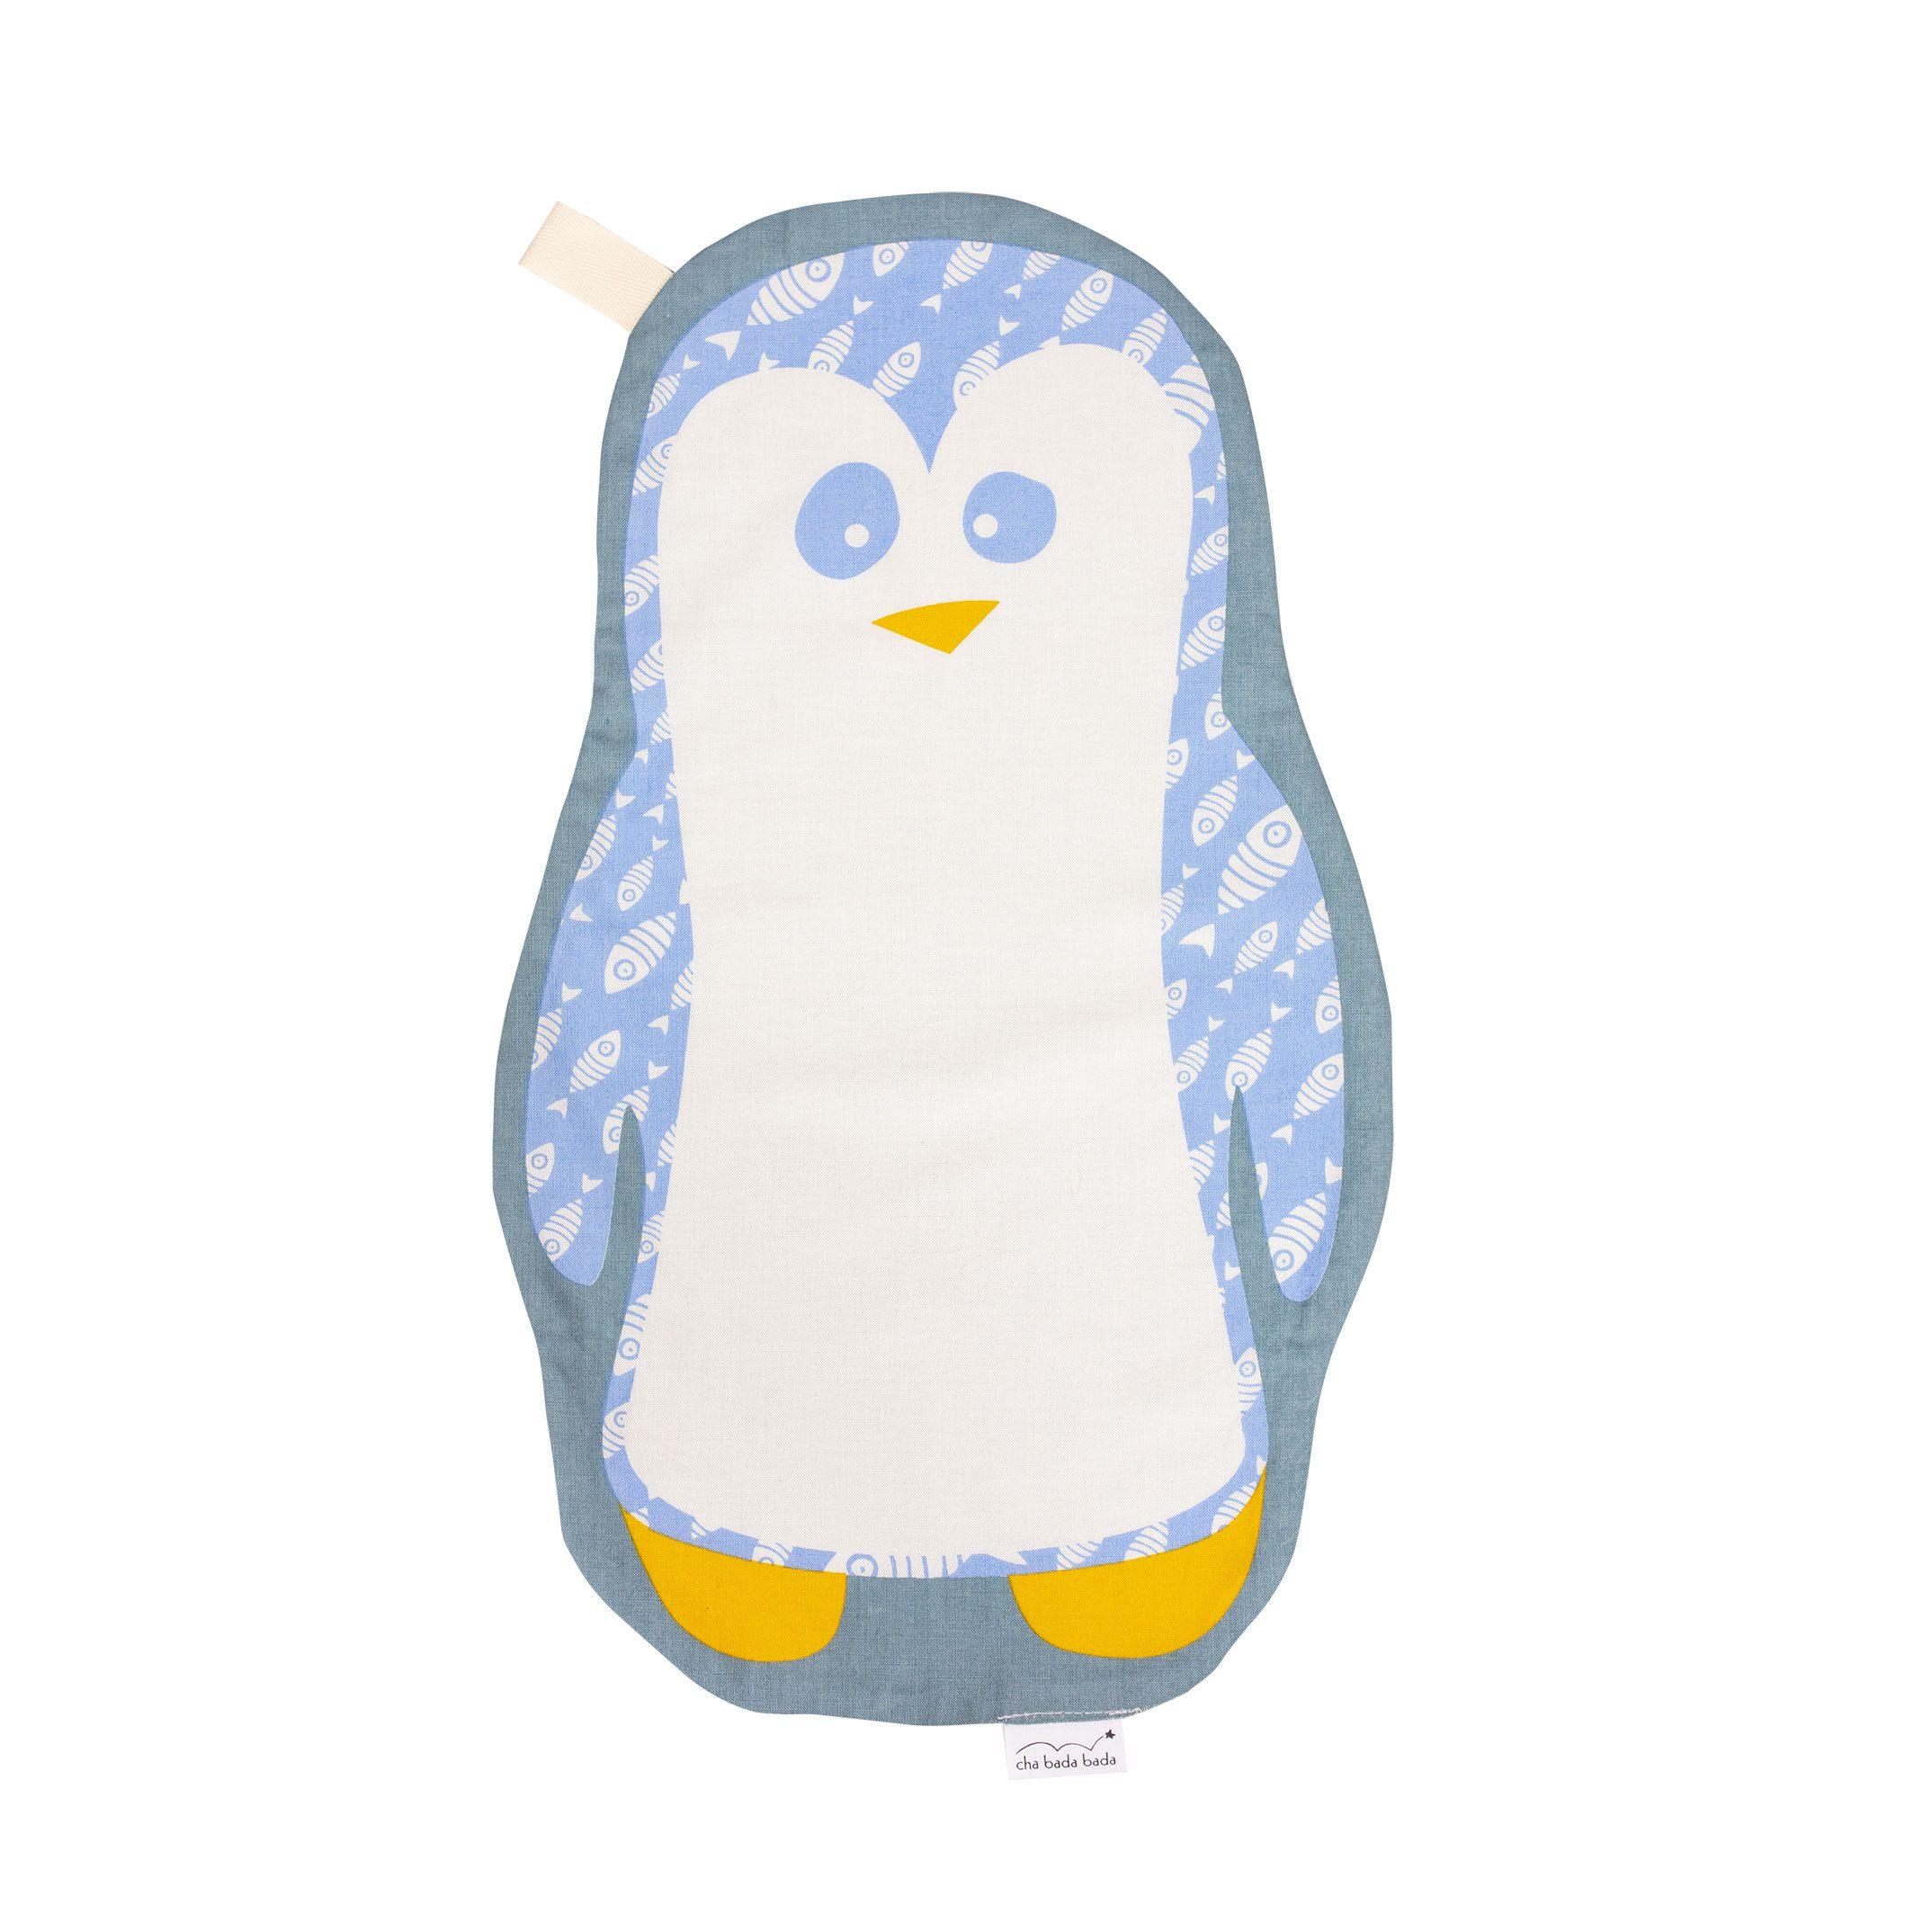 doudou plat en coton bio kurt le pingouin